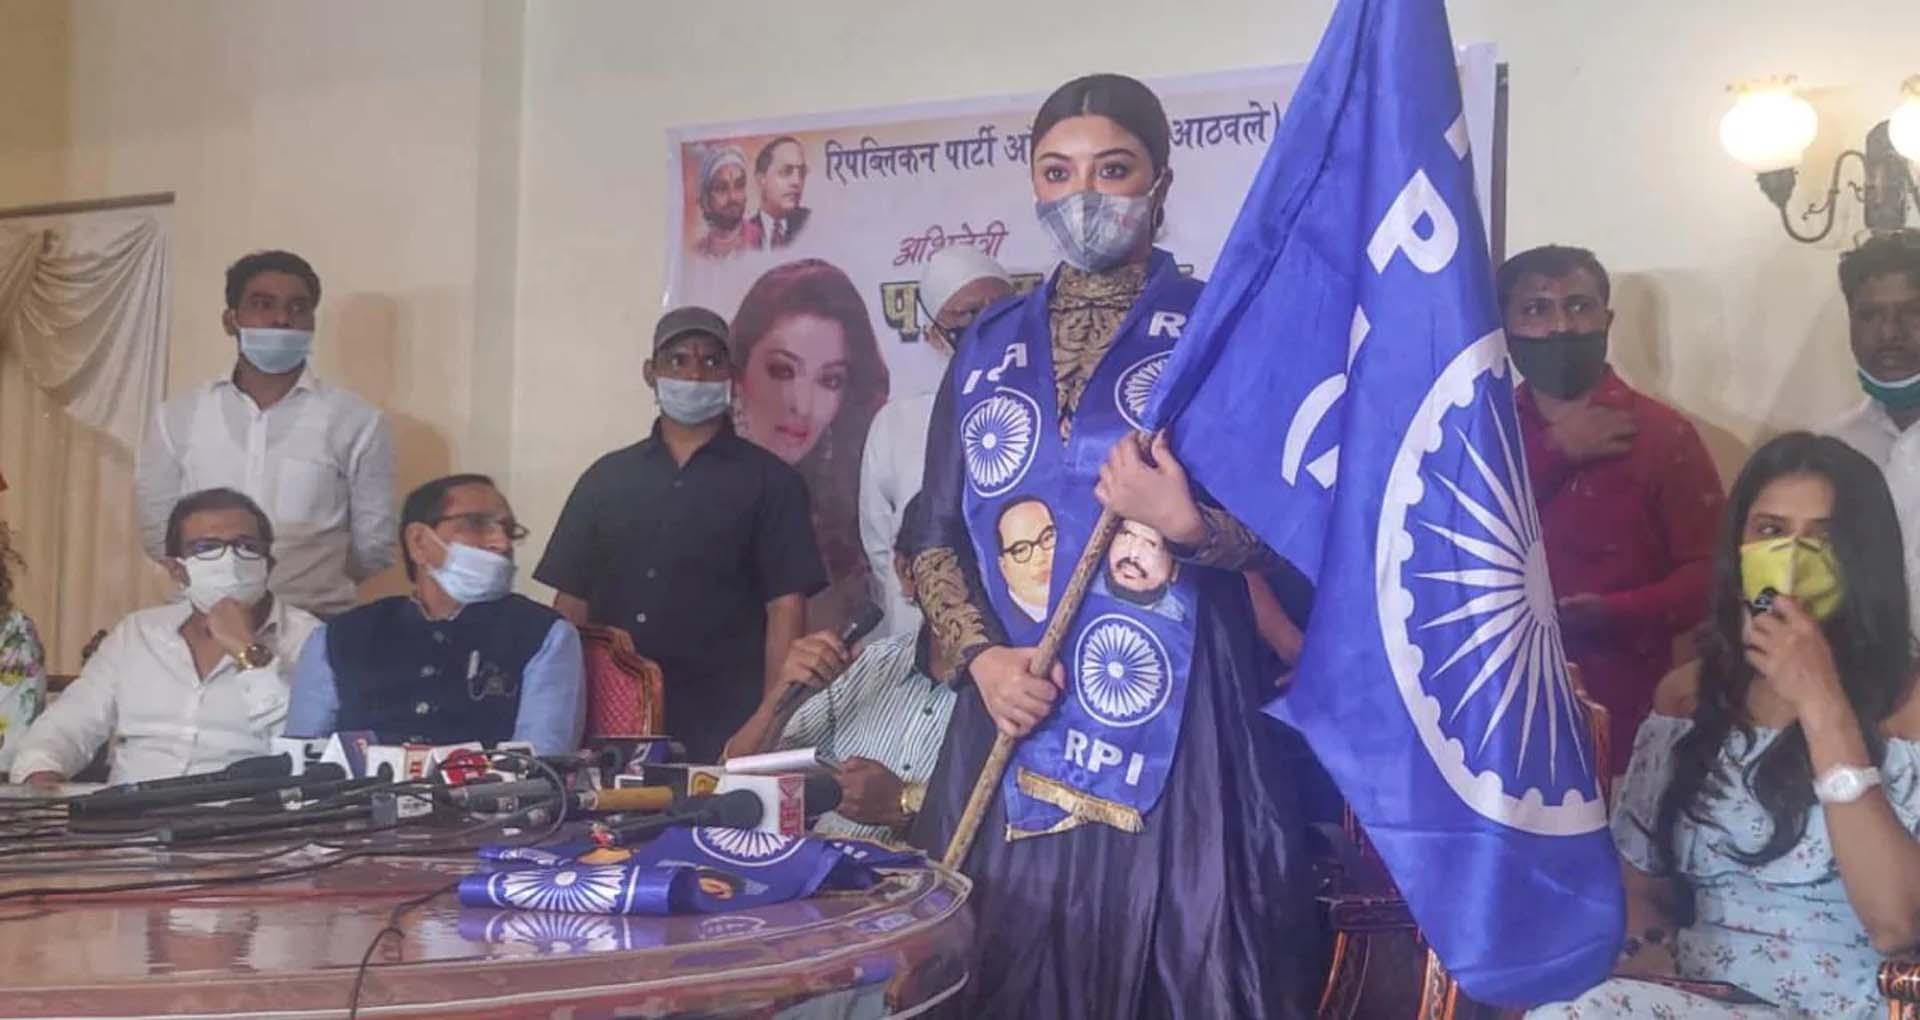 पायल घोष ने थामा अठावले की पार्टी RPI का दामन, अठावले ने कहा- 'अनुराग कश्यप को किया घायल…'